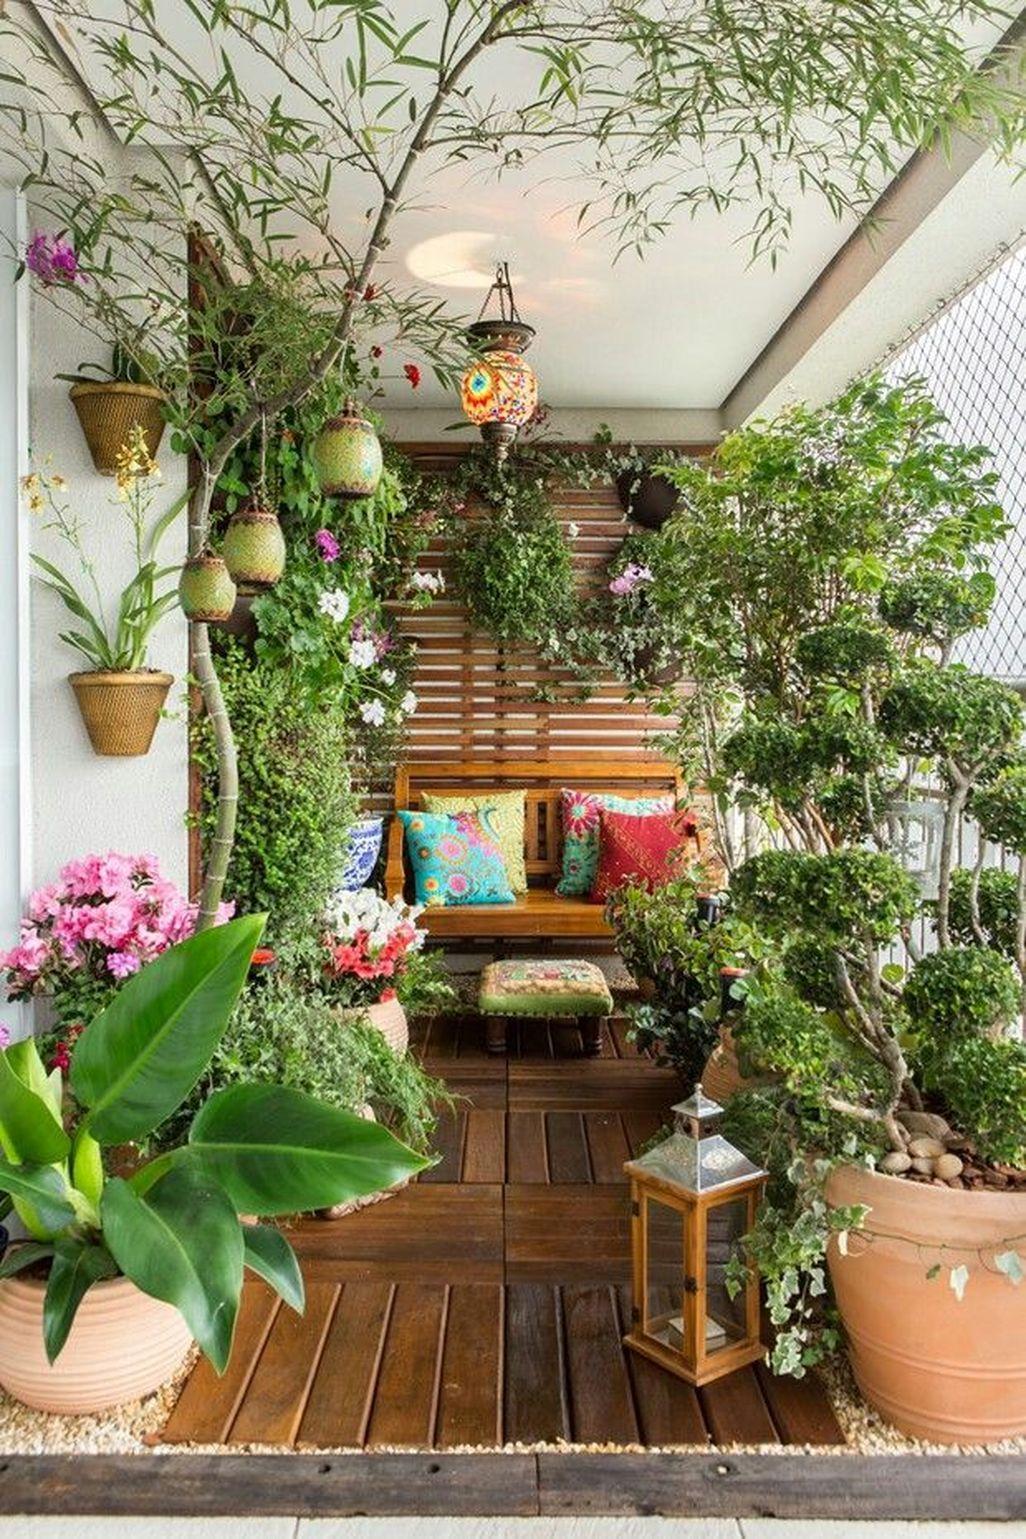 Green Room Garden Design: 41 Cozy And Beautiful Green Balcony Ideas